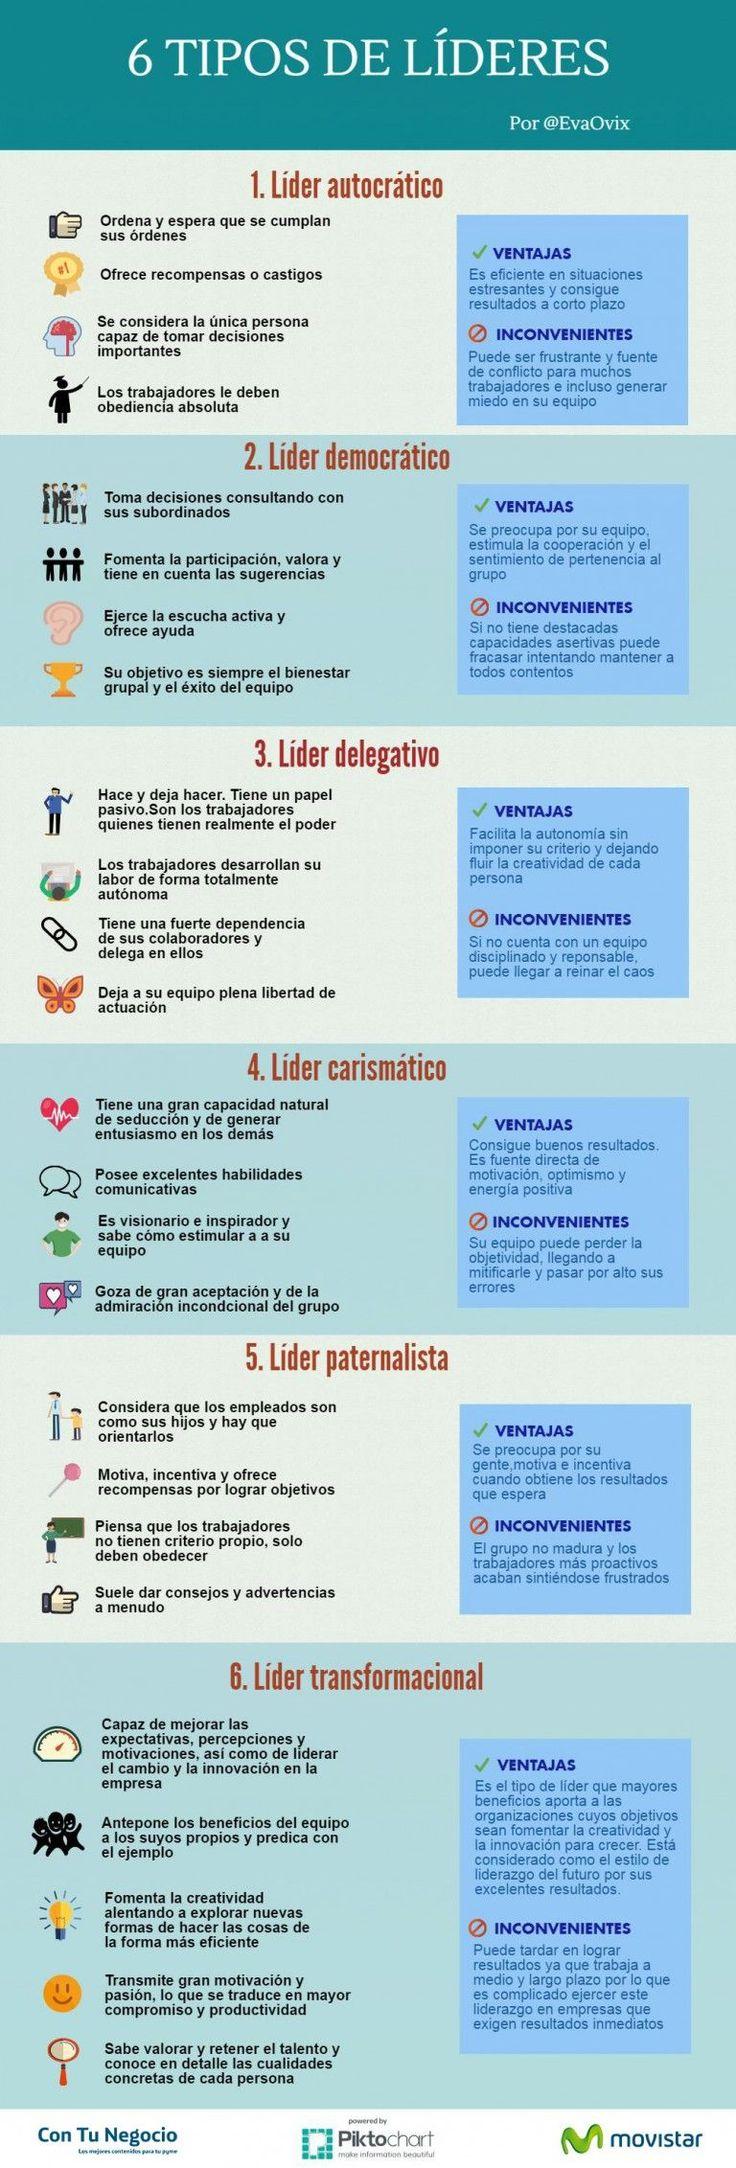 infografia-tipos-de-lideres